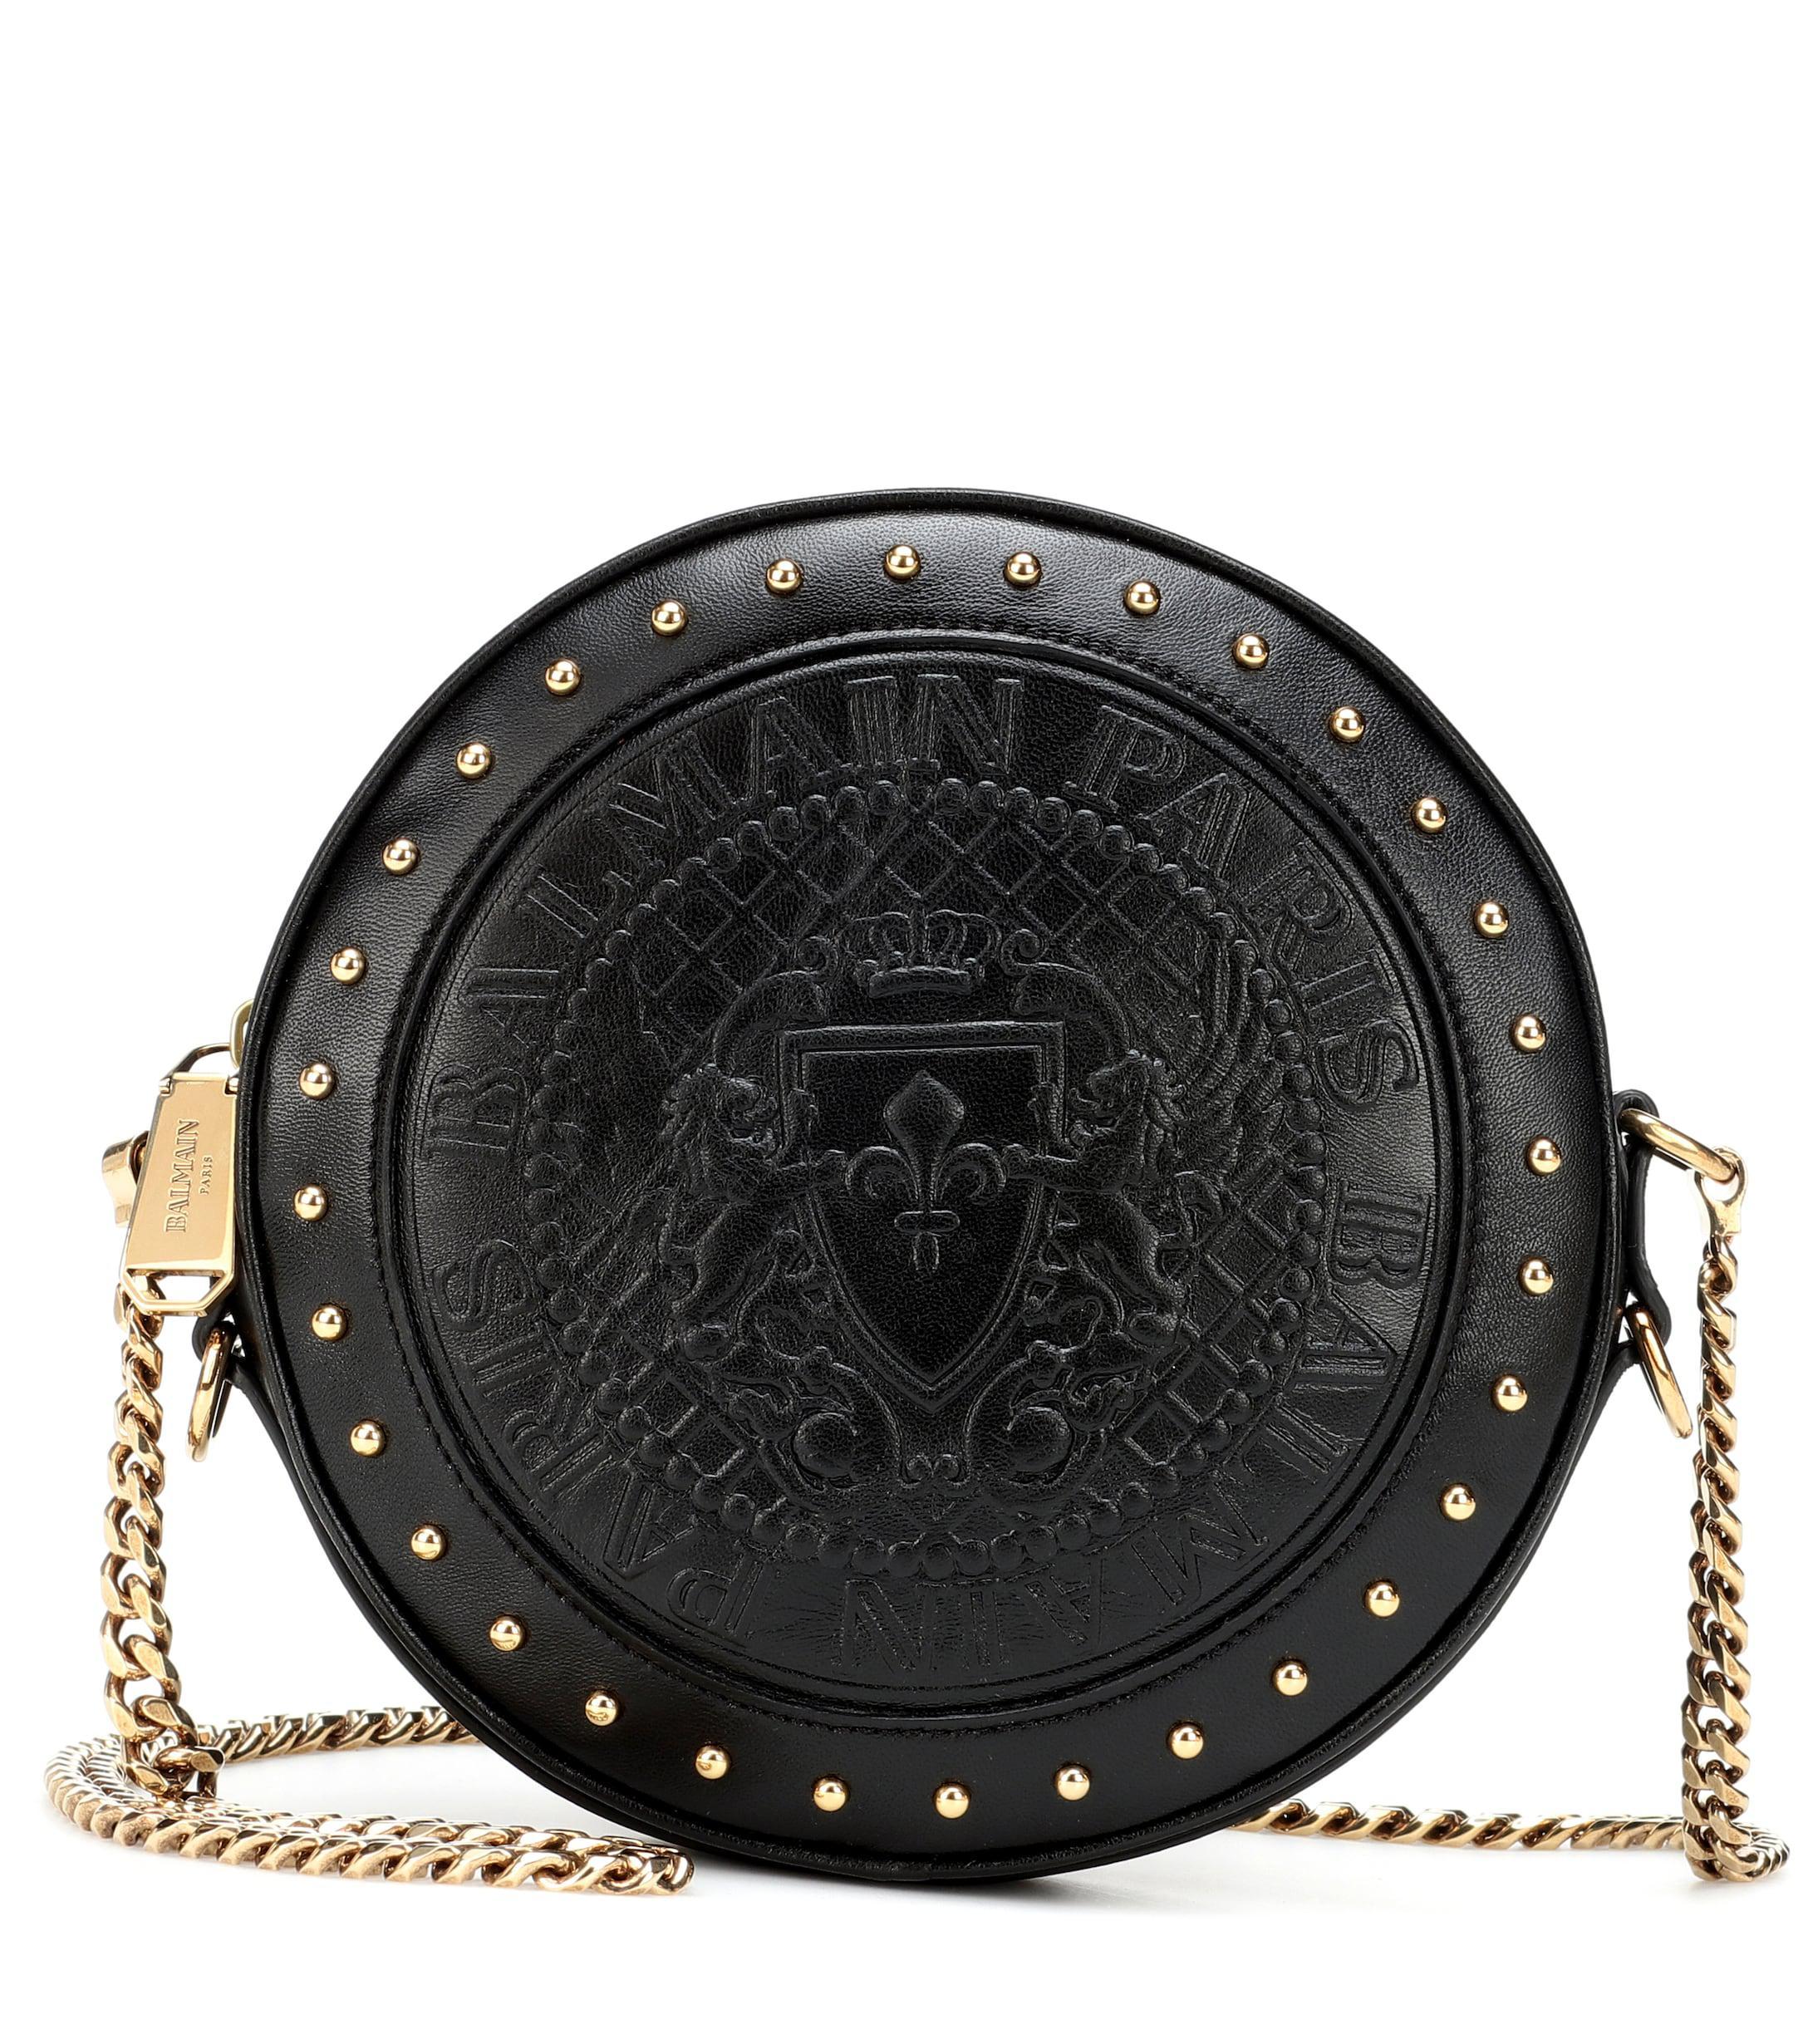 f741af12a32 Balmain - Black Renaissance Leather Crossbody Bag - Lyst. View fullscreen